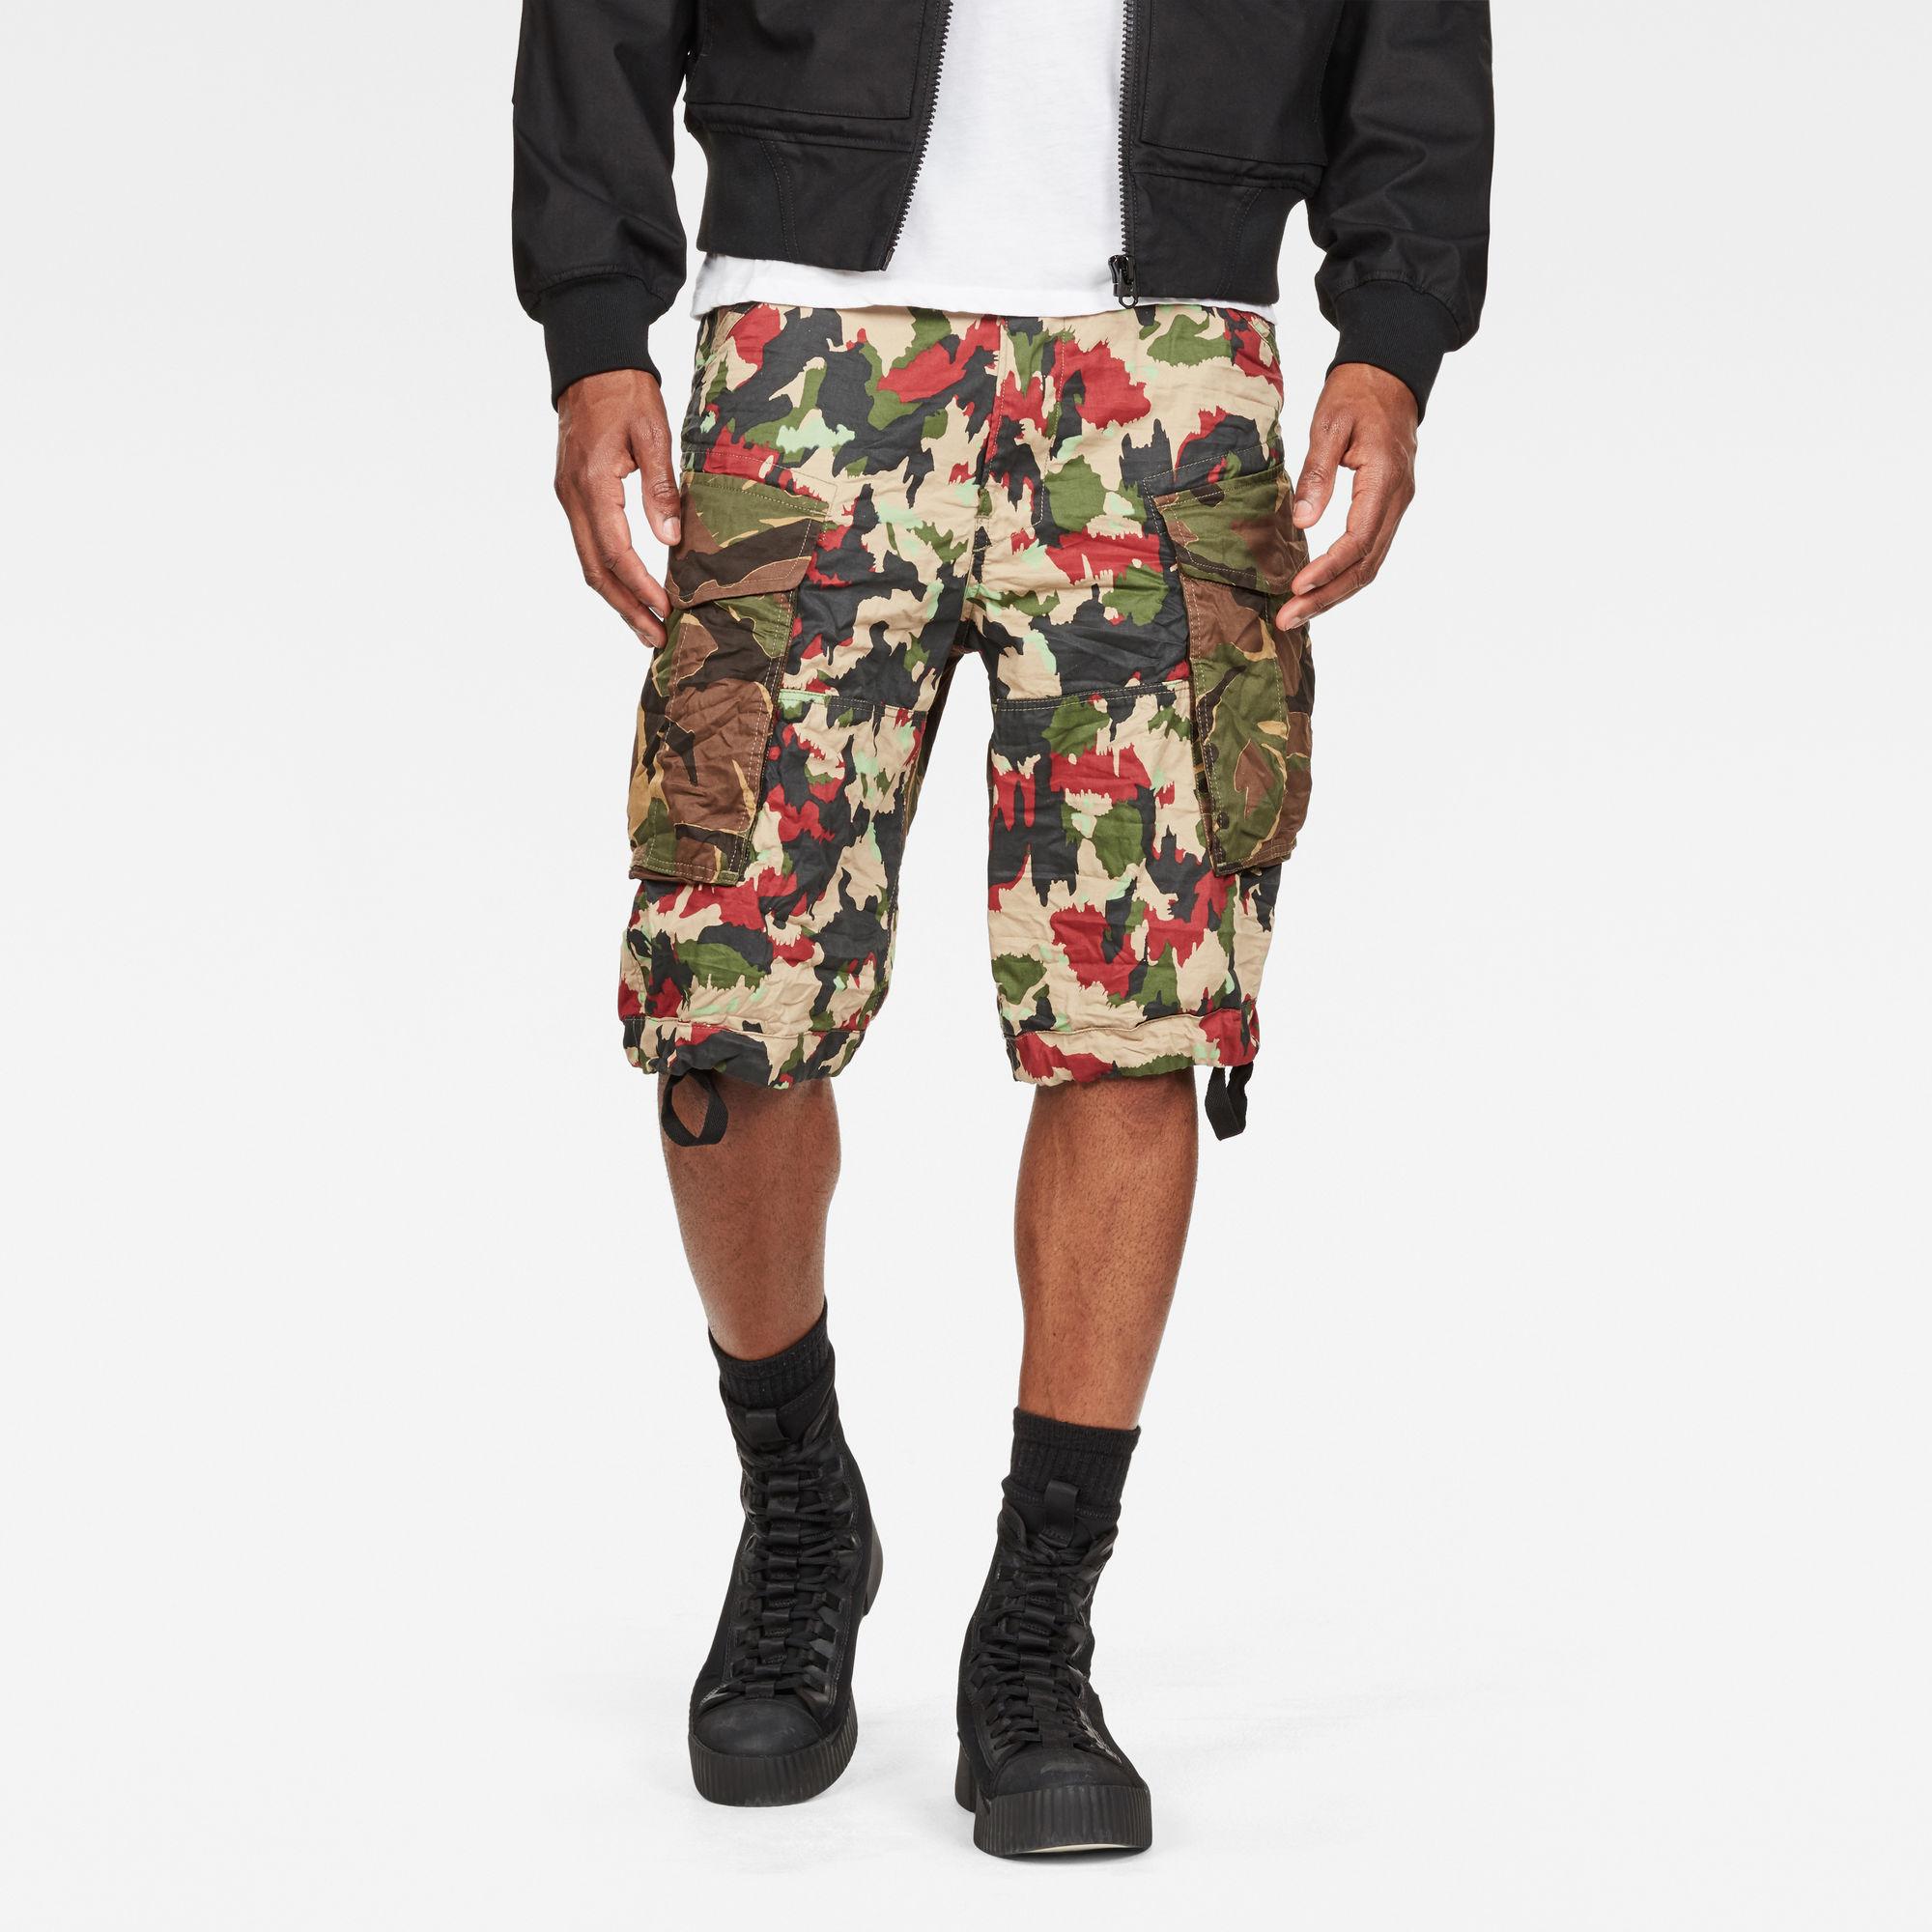 Rovic Raw Correct Relaxed 1 2-Length Shorts